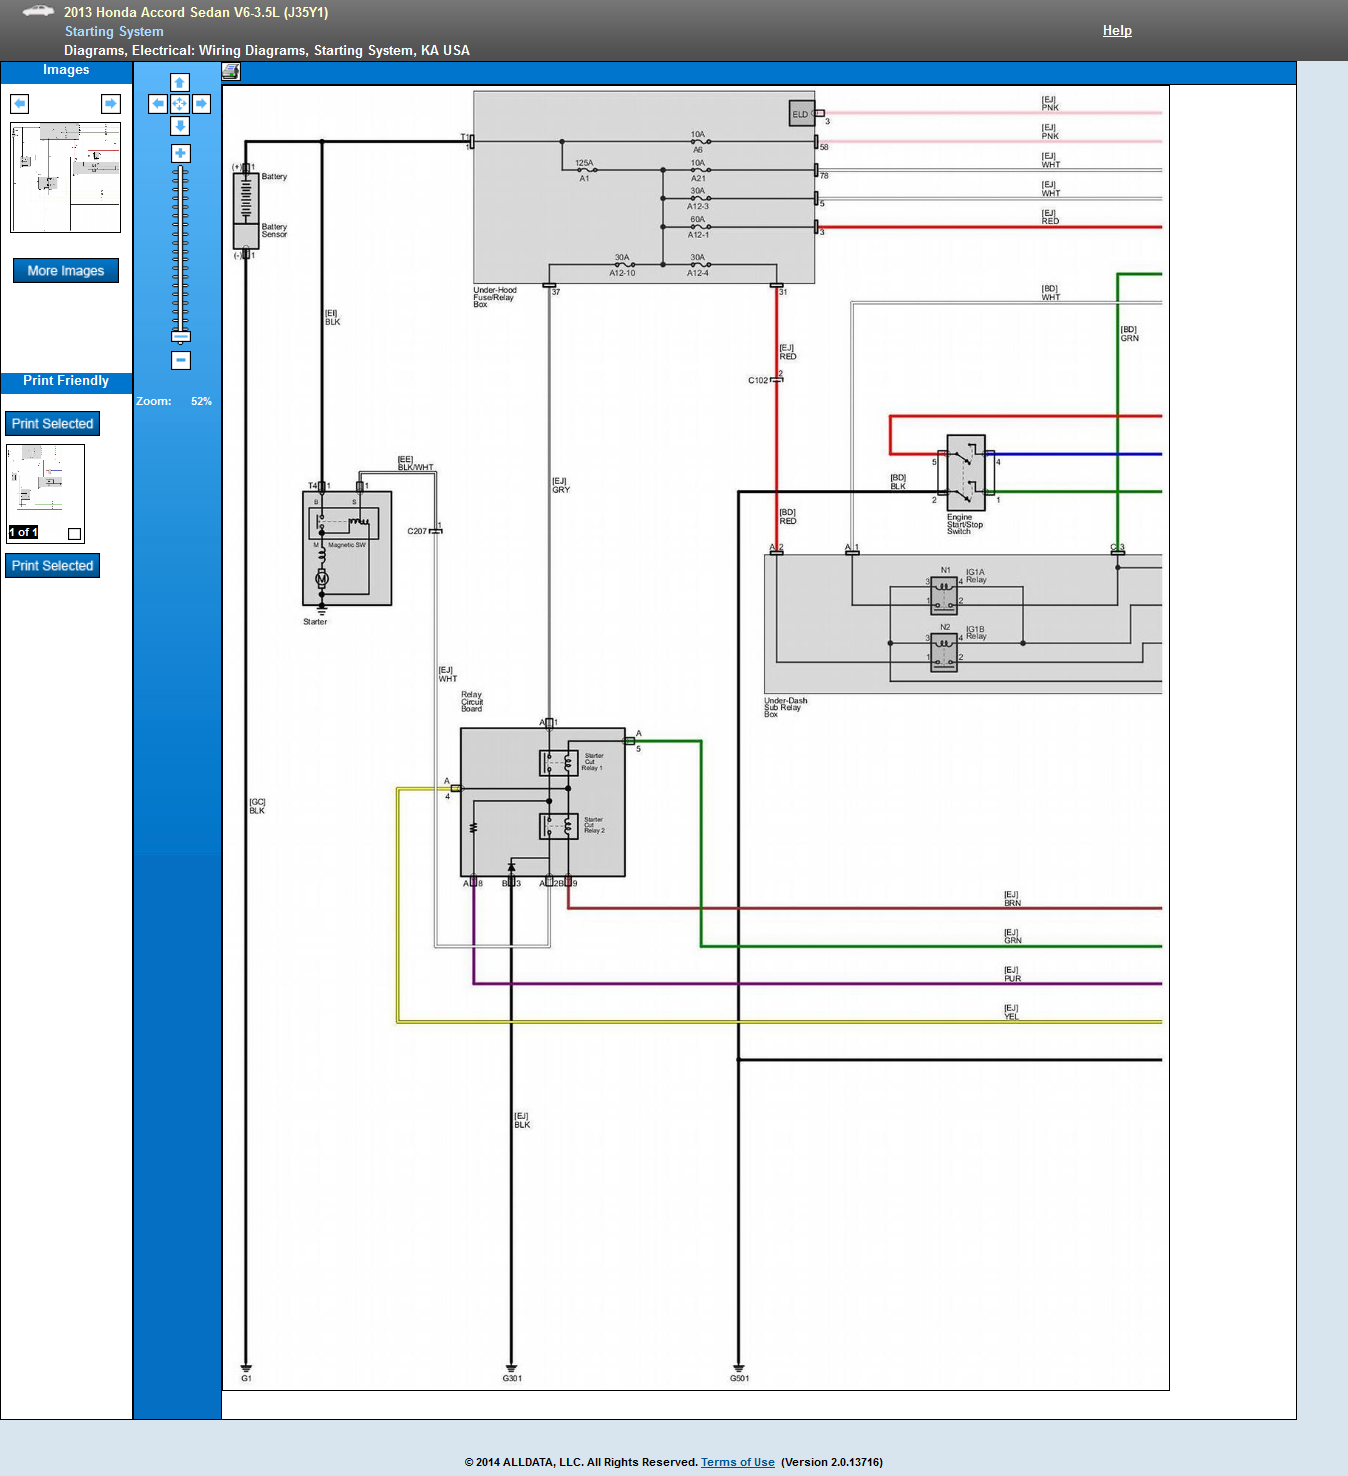 Diagram Honda Accord Wiring Diagram 2013 Full Version Hd Quality Diagram 2013 Diagramrayos Apd Audax It